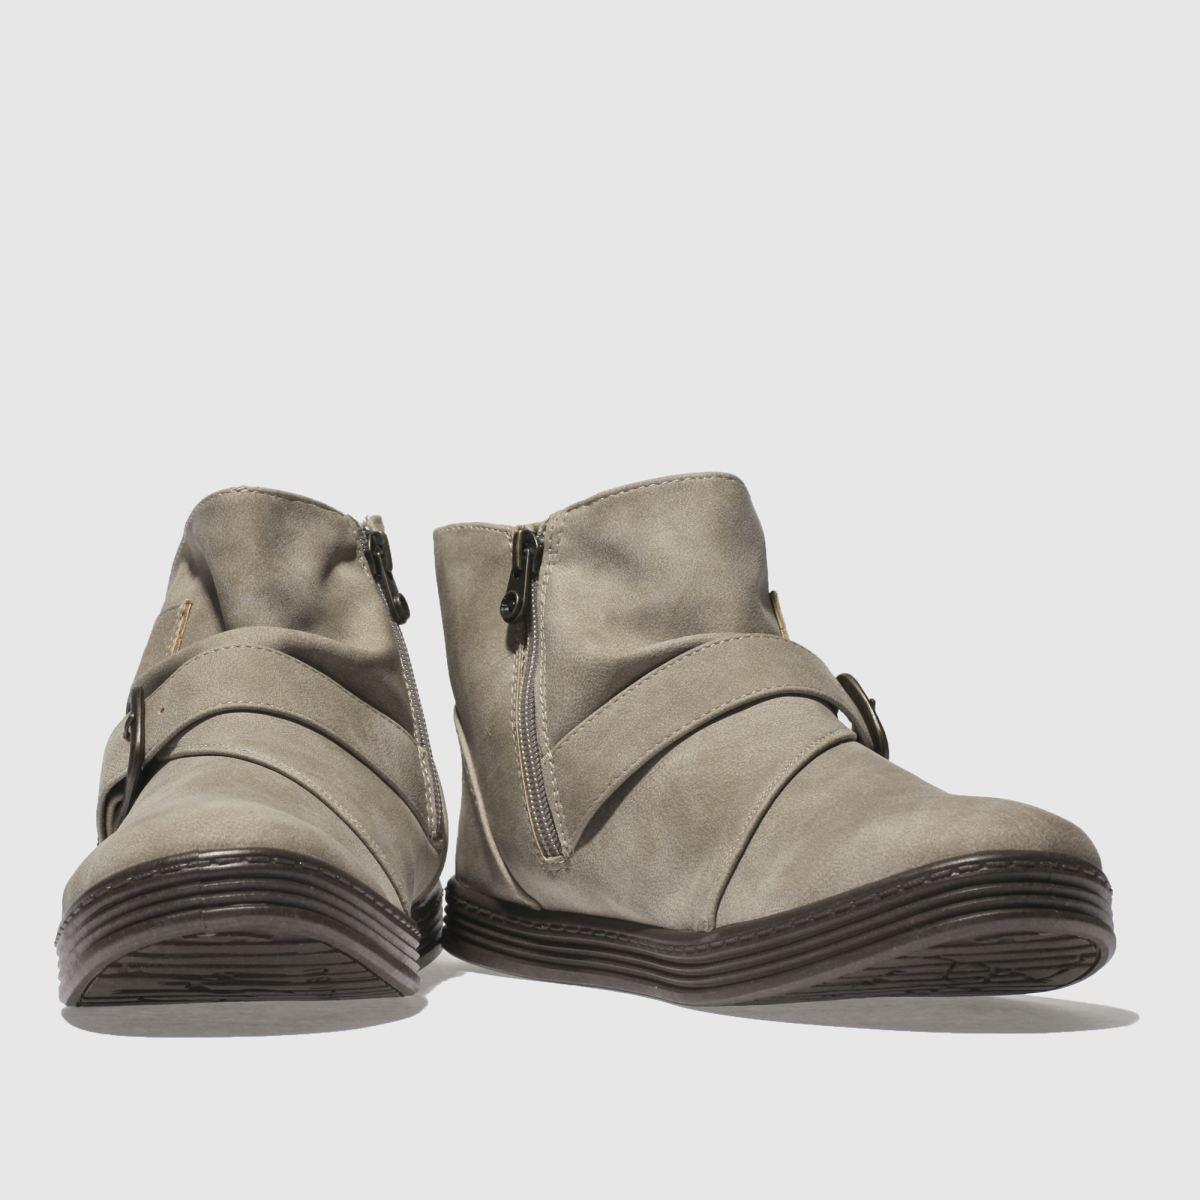 Damen Naturfarben blowfish Frappe Boots | schuh Gute Qualität beliebte Schuhe